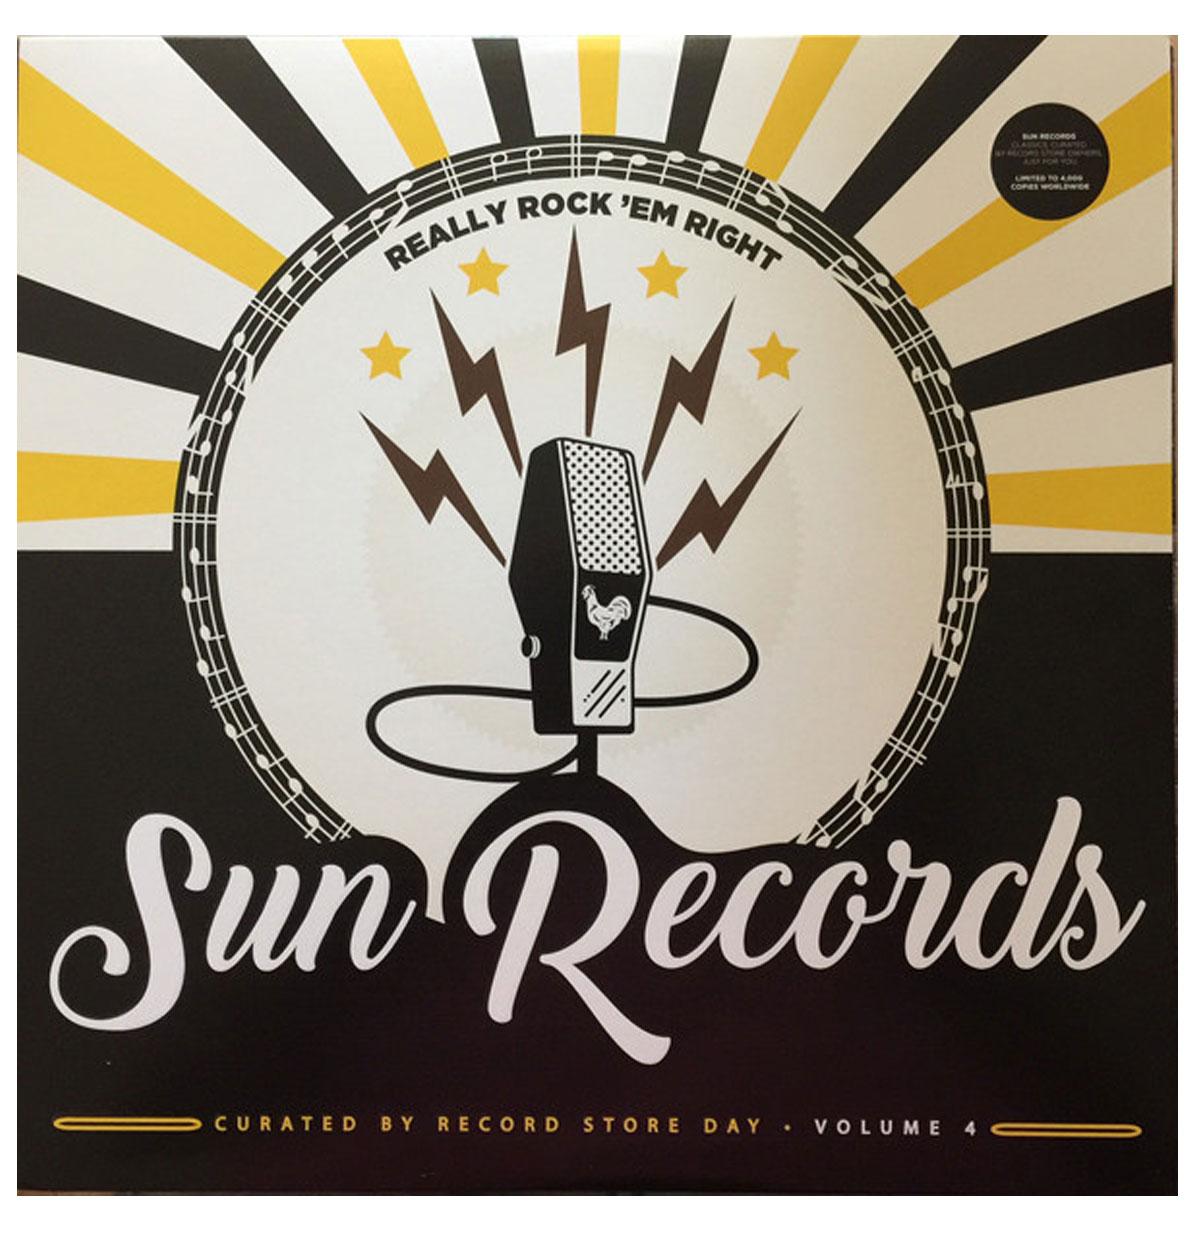 Sun Records - Really Rock 'Em Right Volume 4 LP